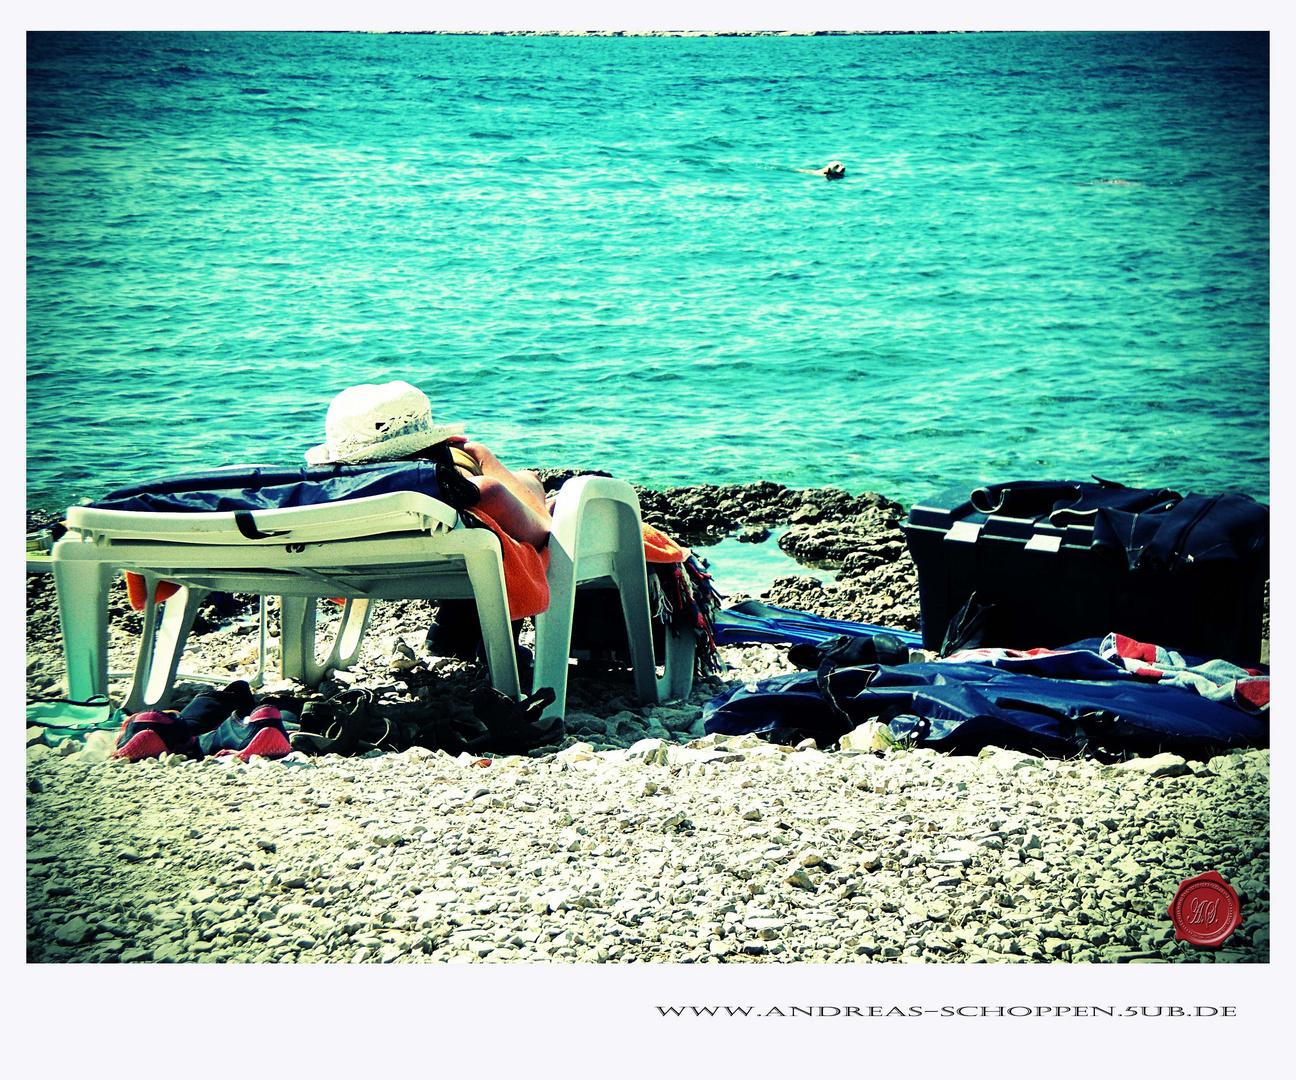 Mittagspause am Strand